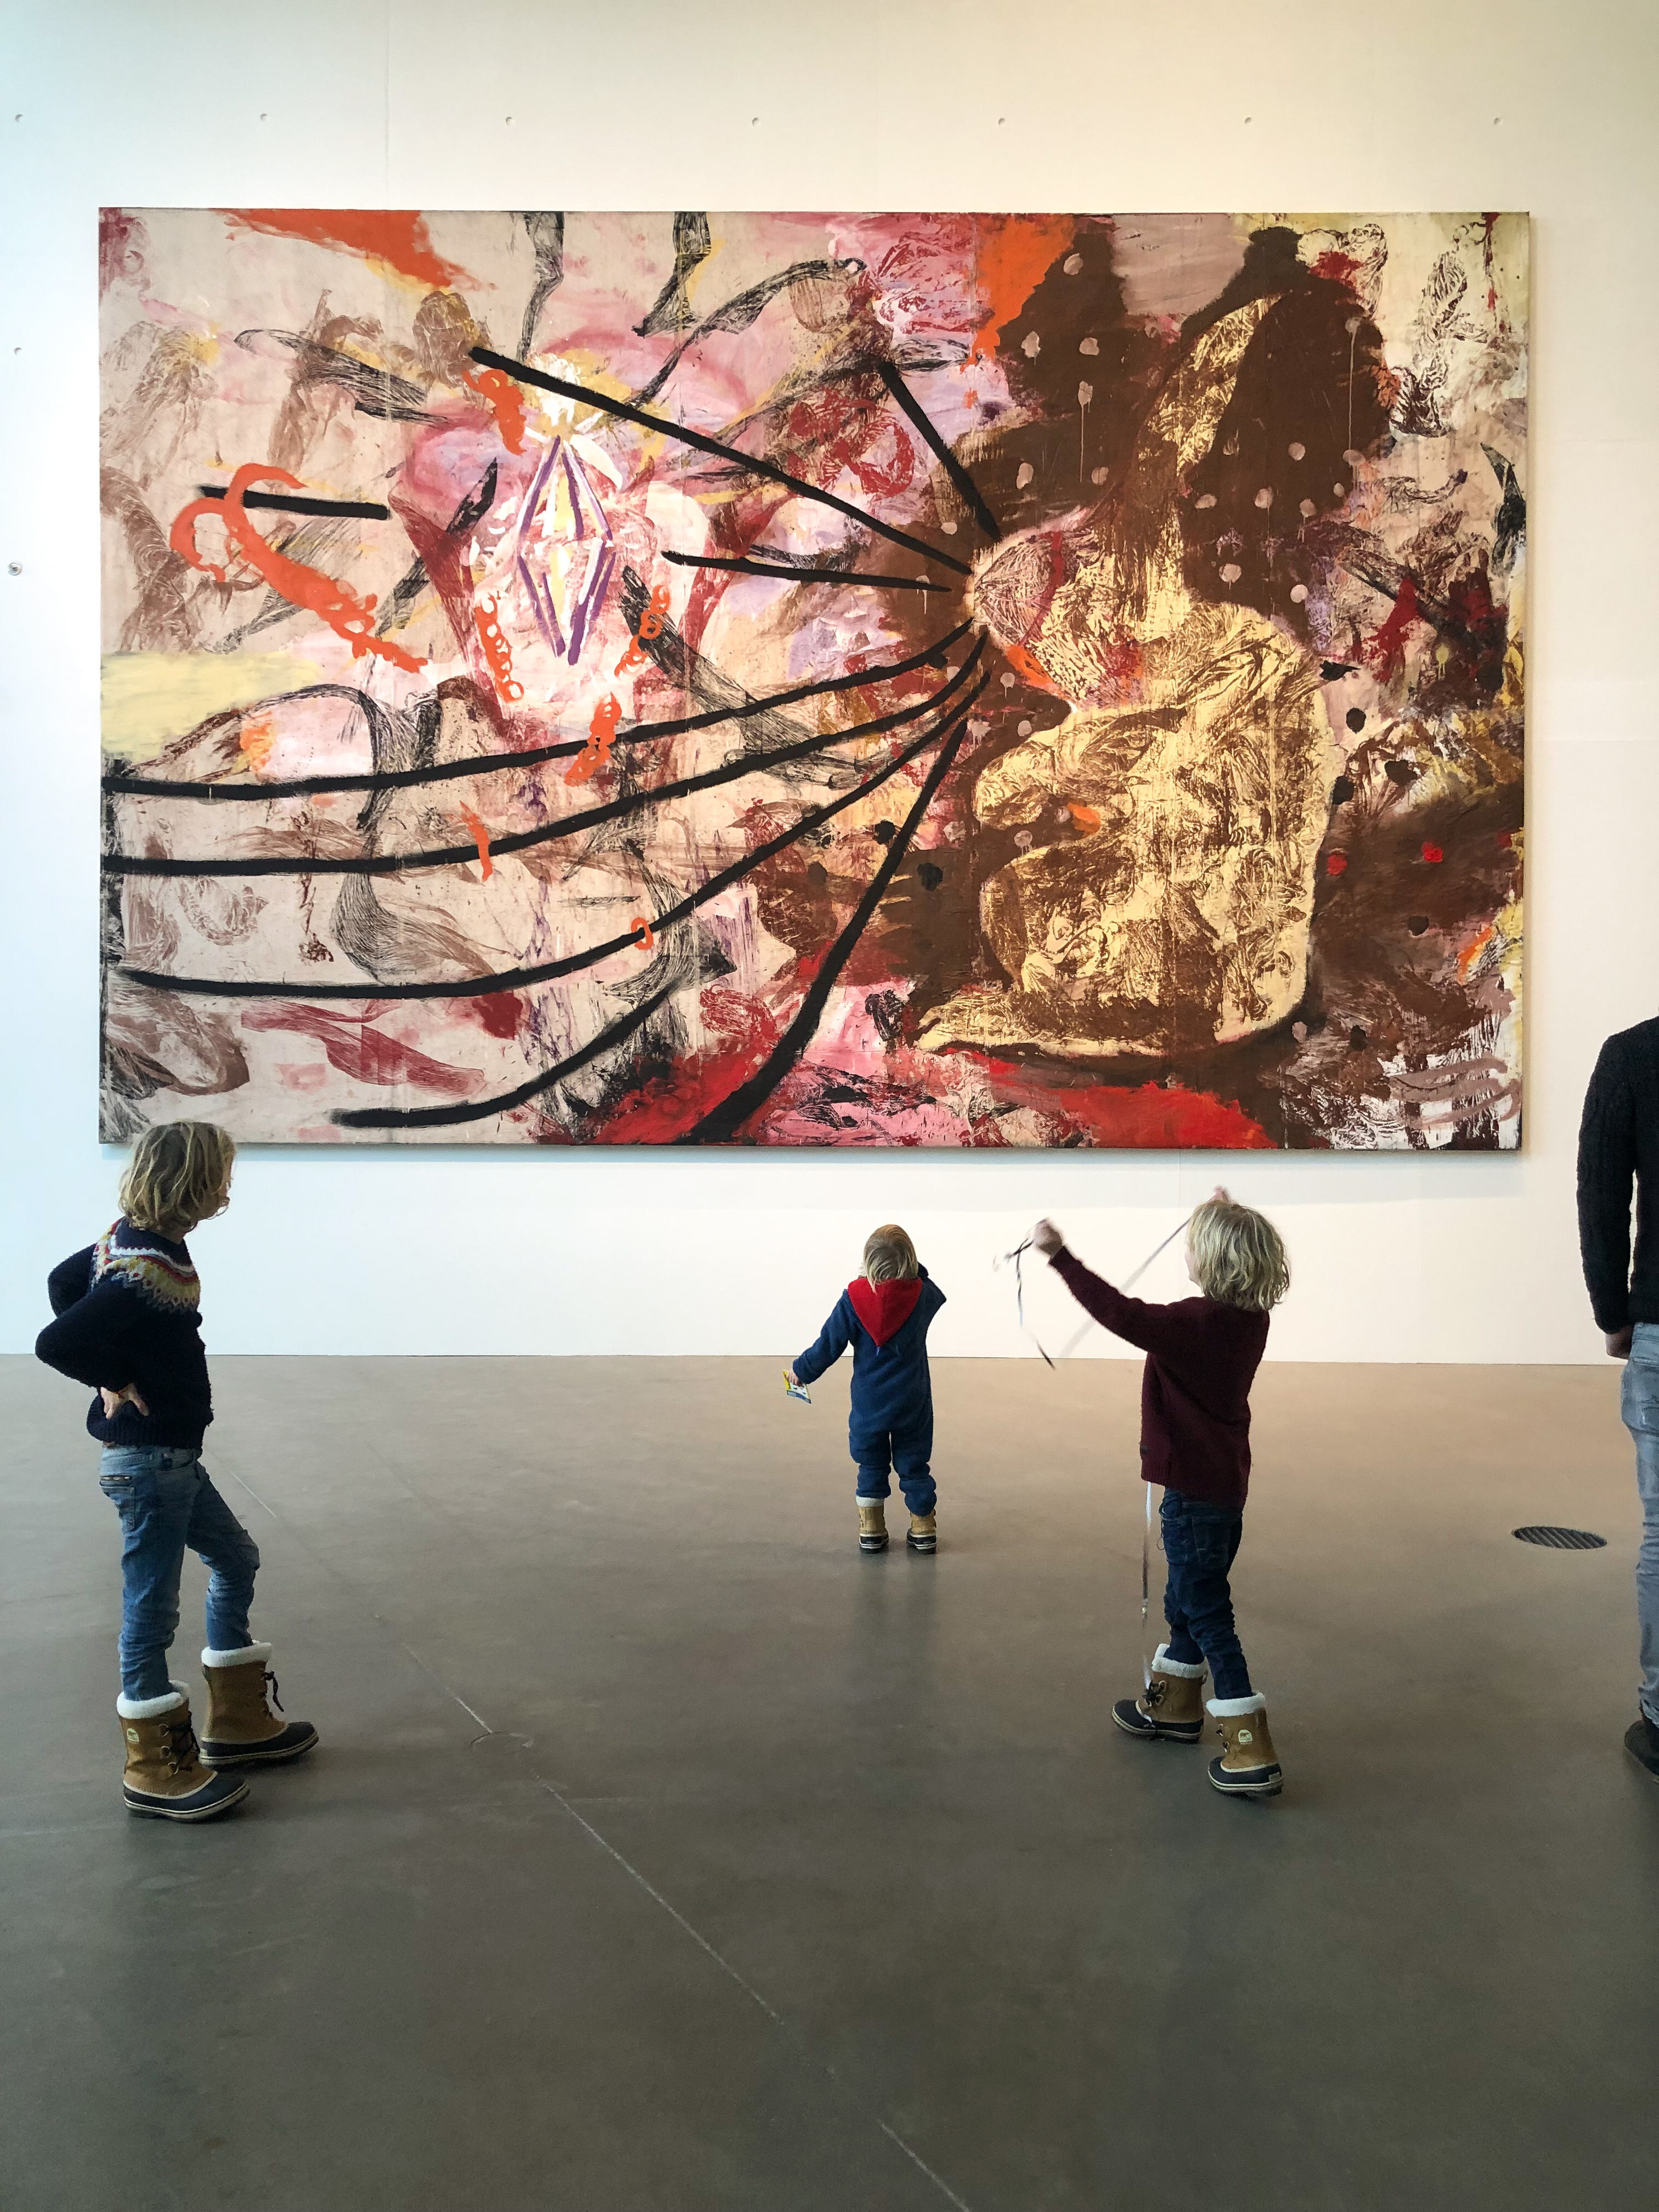 Aarhus mit Kindern, Klatschbilder, Wurfbilder, Kunstmuseum mit Kindern